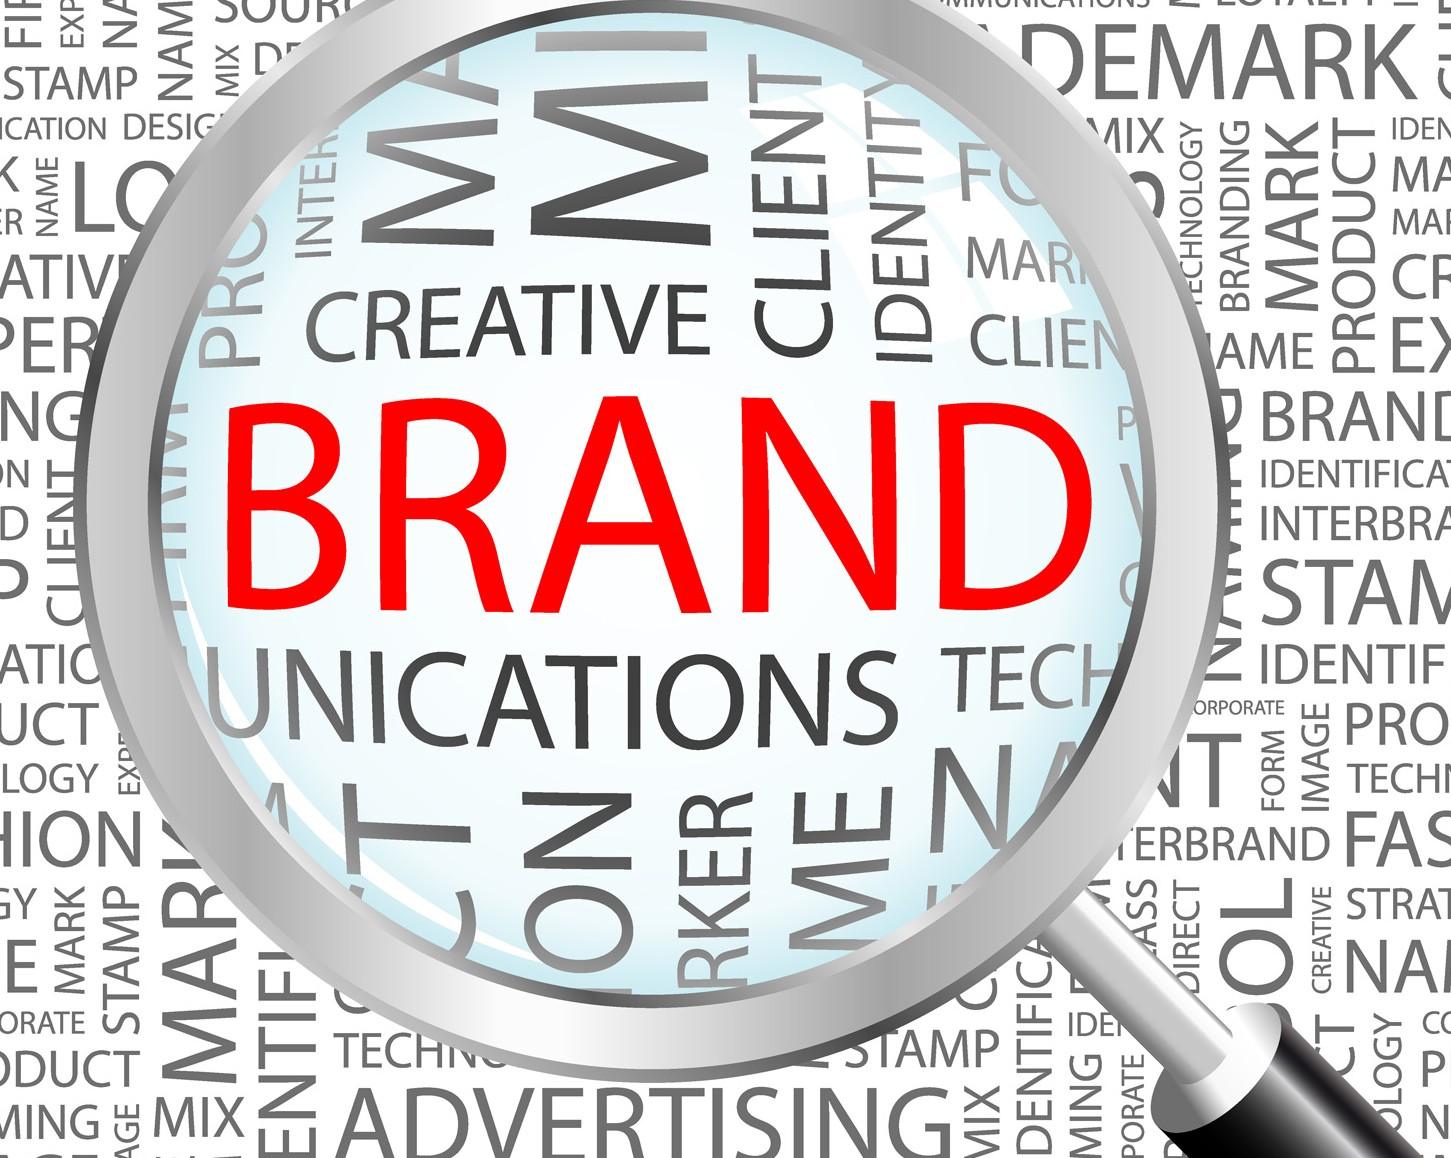 продвижение в интернете бренда